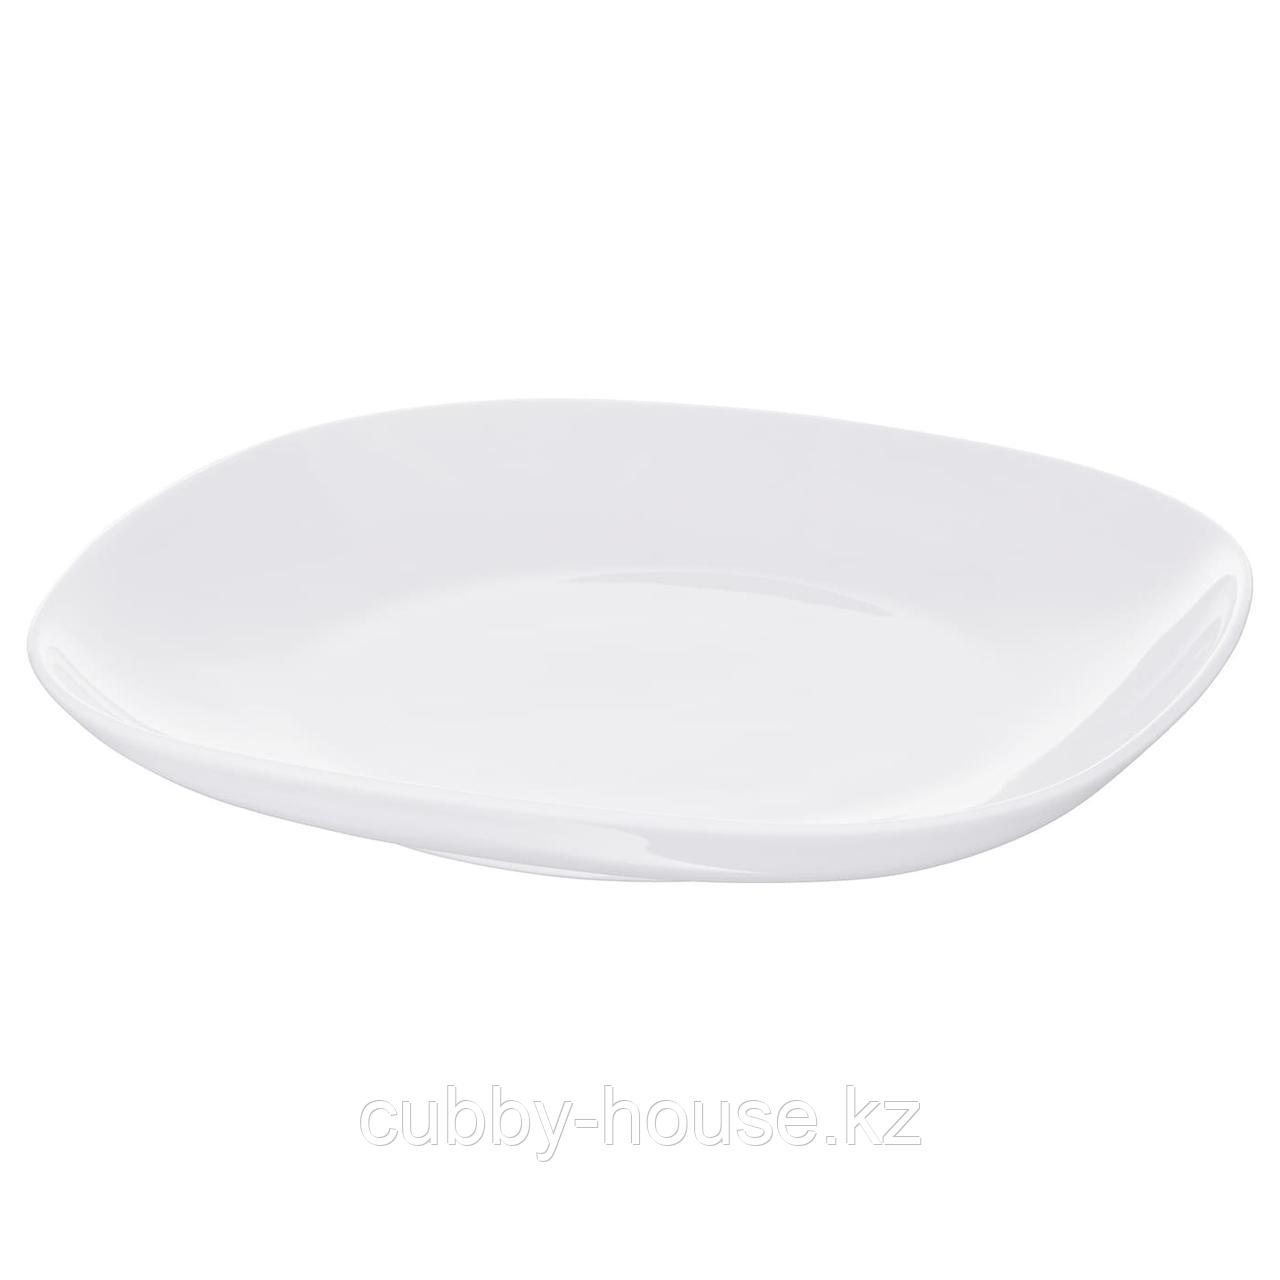 ВЭРДЕРА Тарелка, белый, 25x25 см